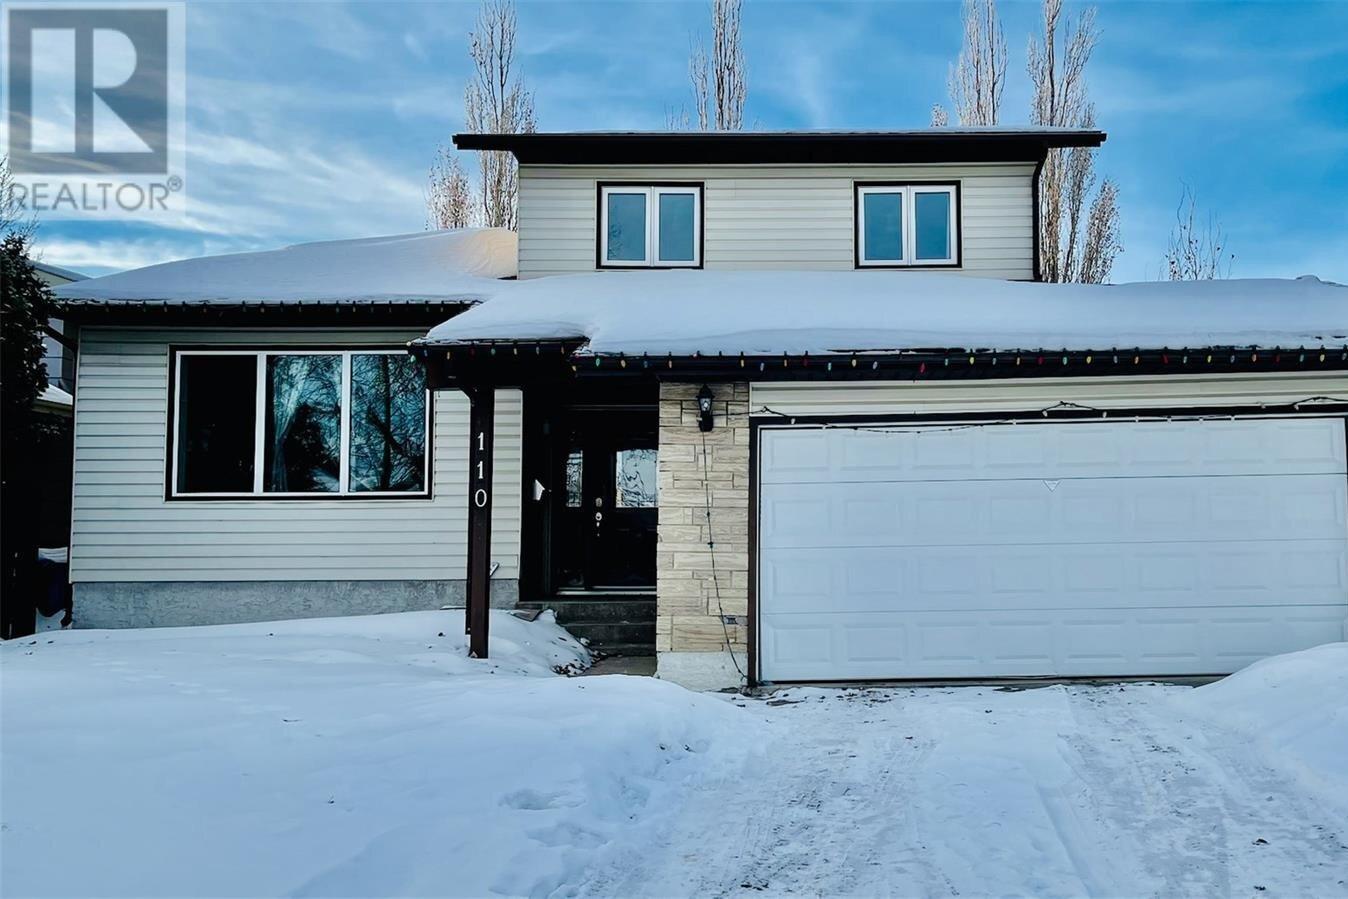 House for sale at 110 Delayen Cres Saskatoon Saskatchewan - MLS: SK838707